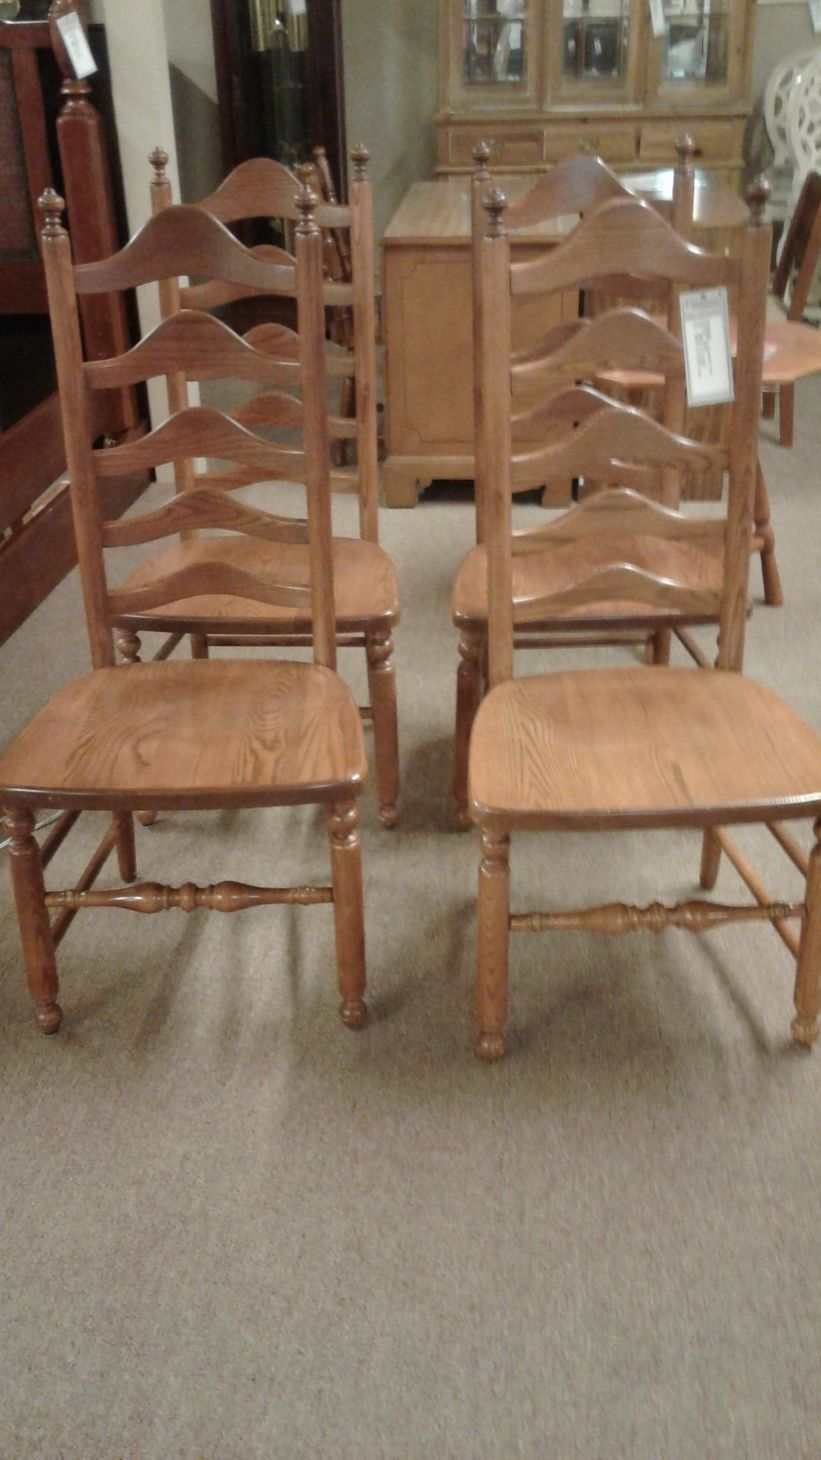 S Bent Amp Bros Ladderback Chairs Delmarva Furniture Consignment